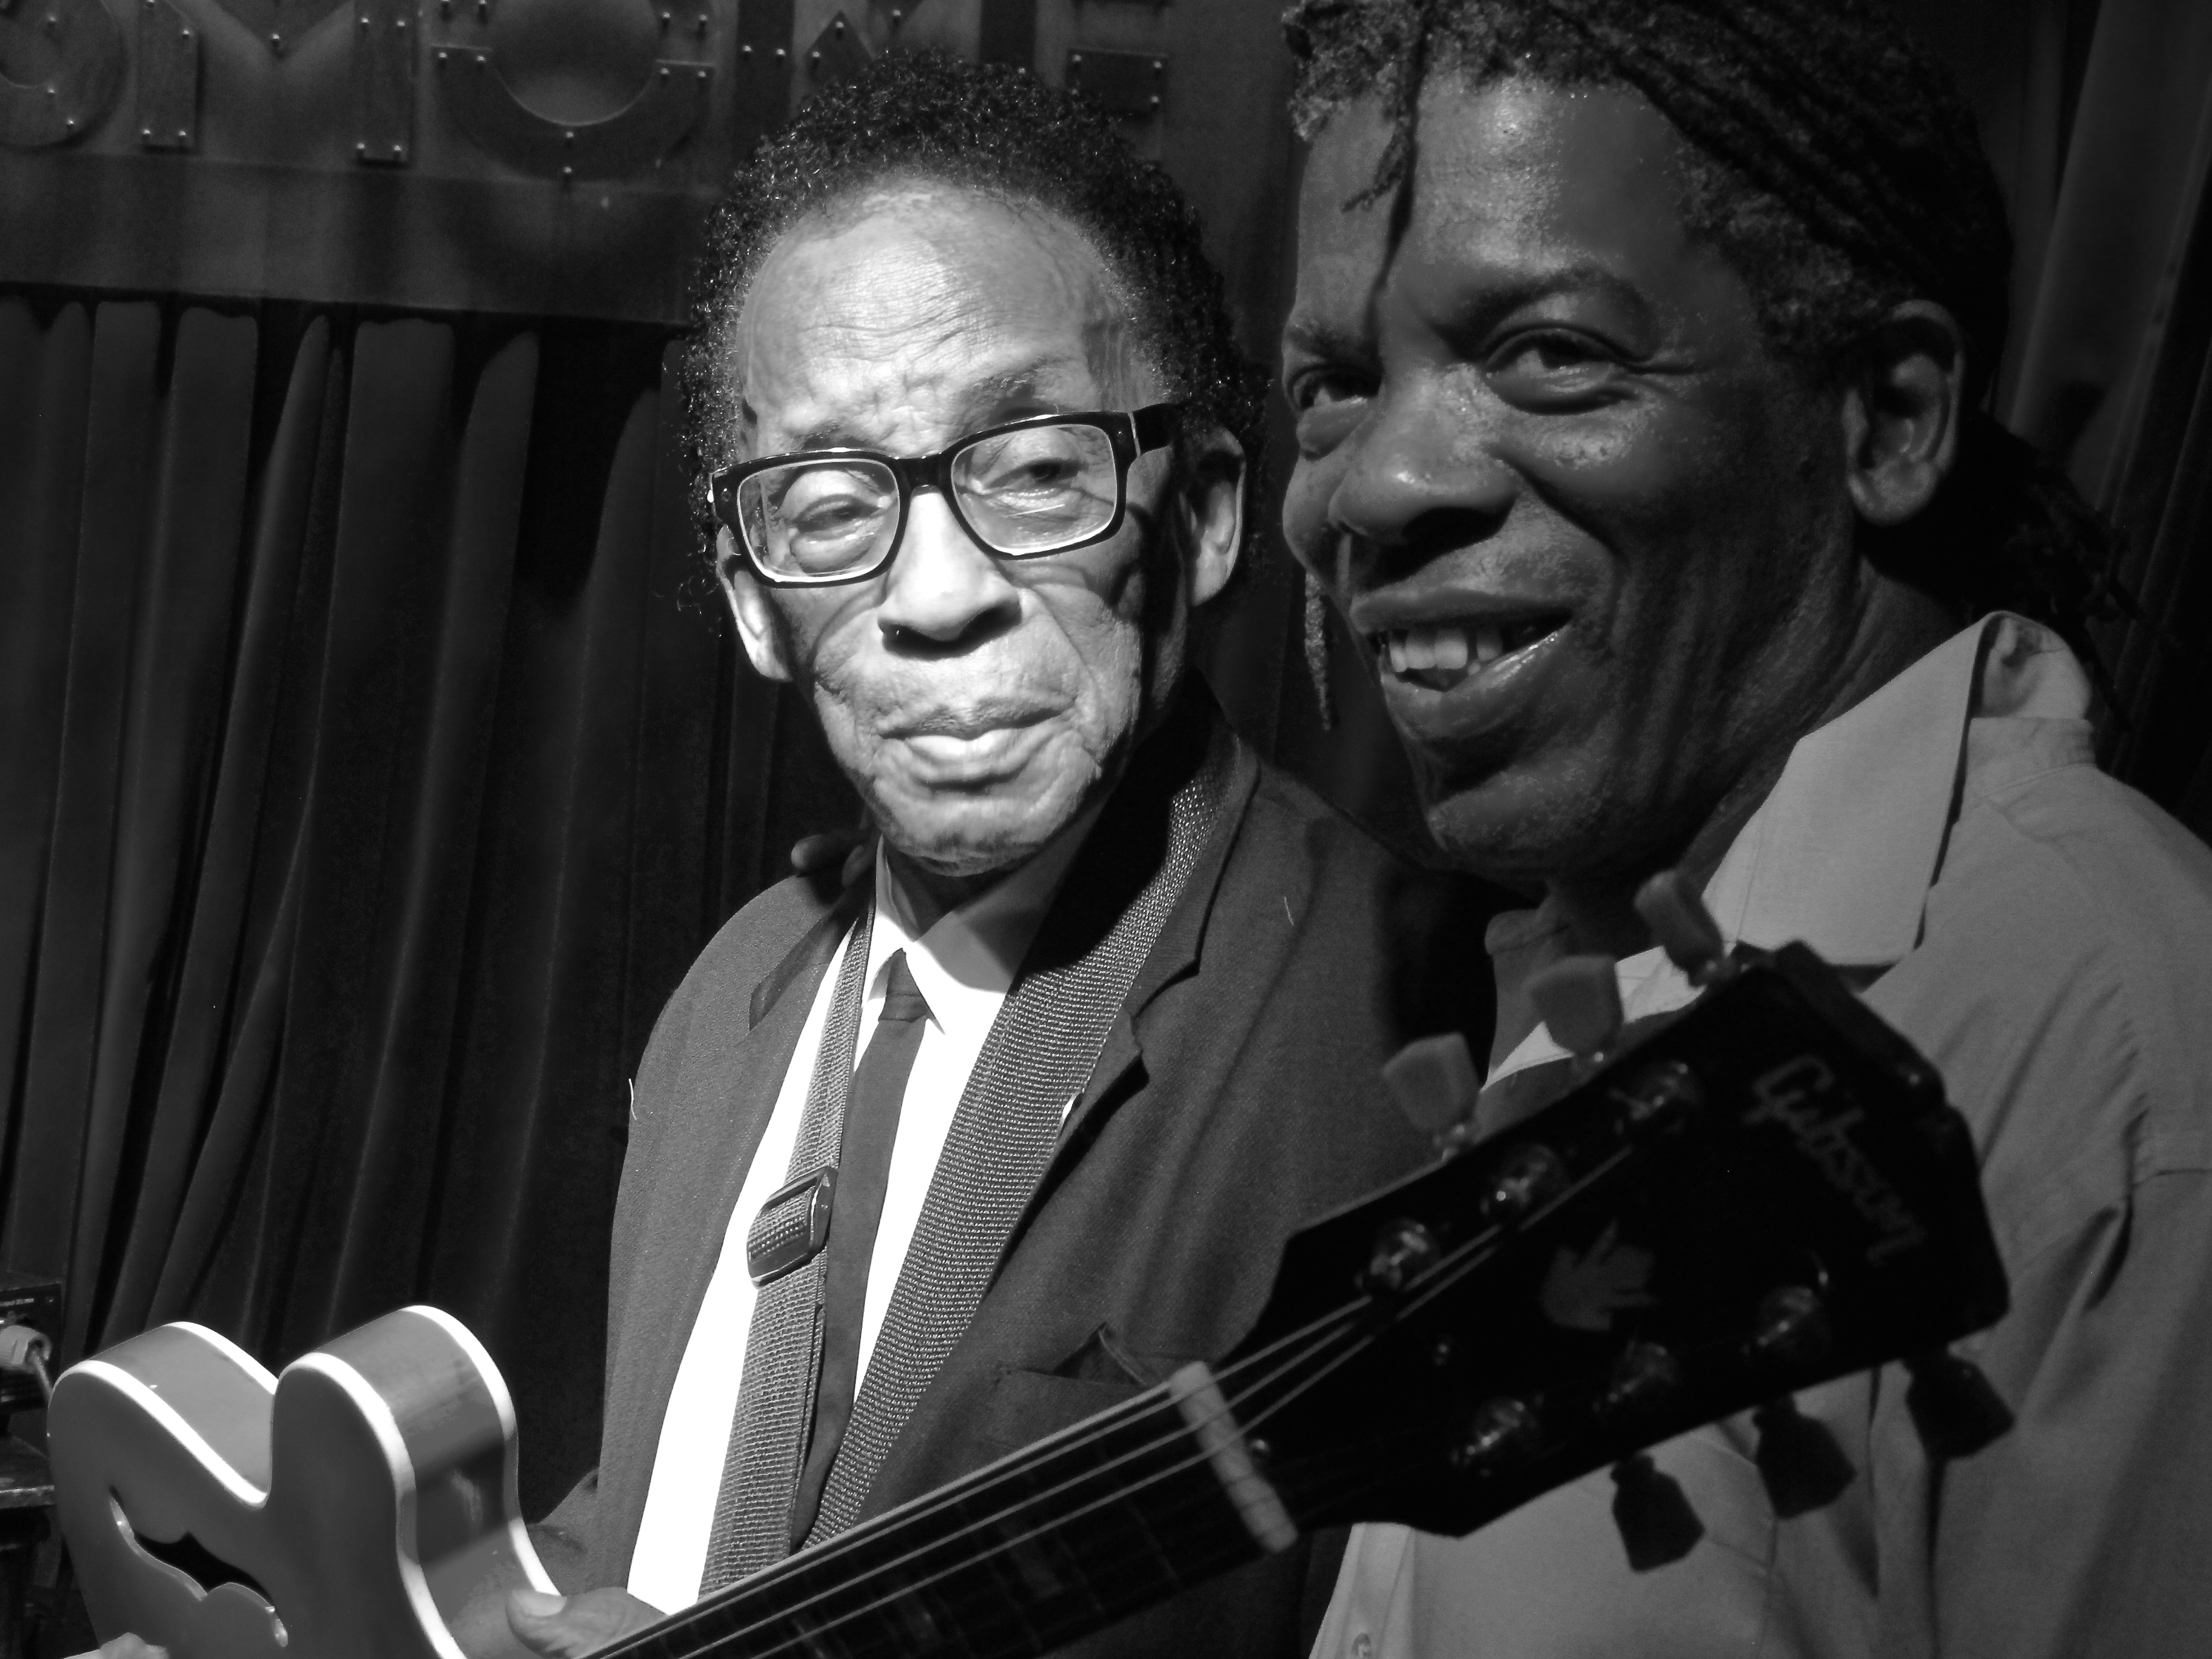 George Freeman and Mark - Photo by Laurence Donohue-Greene